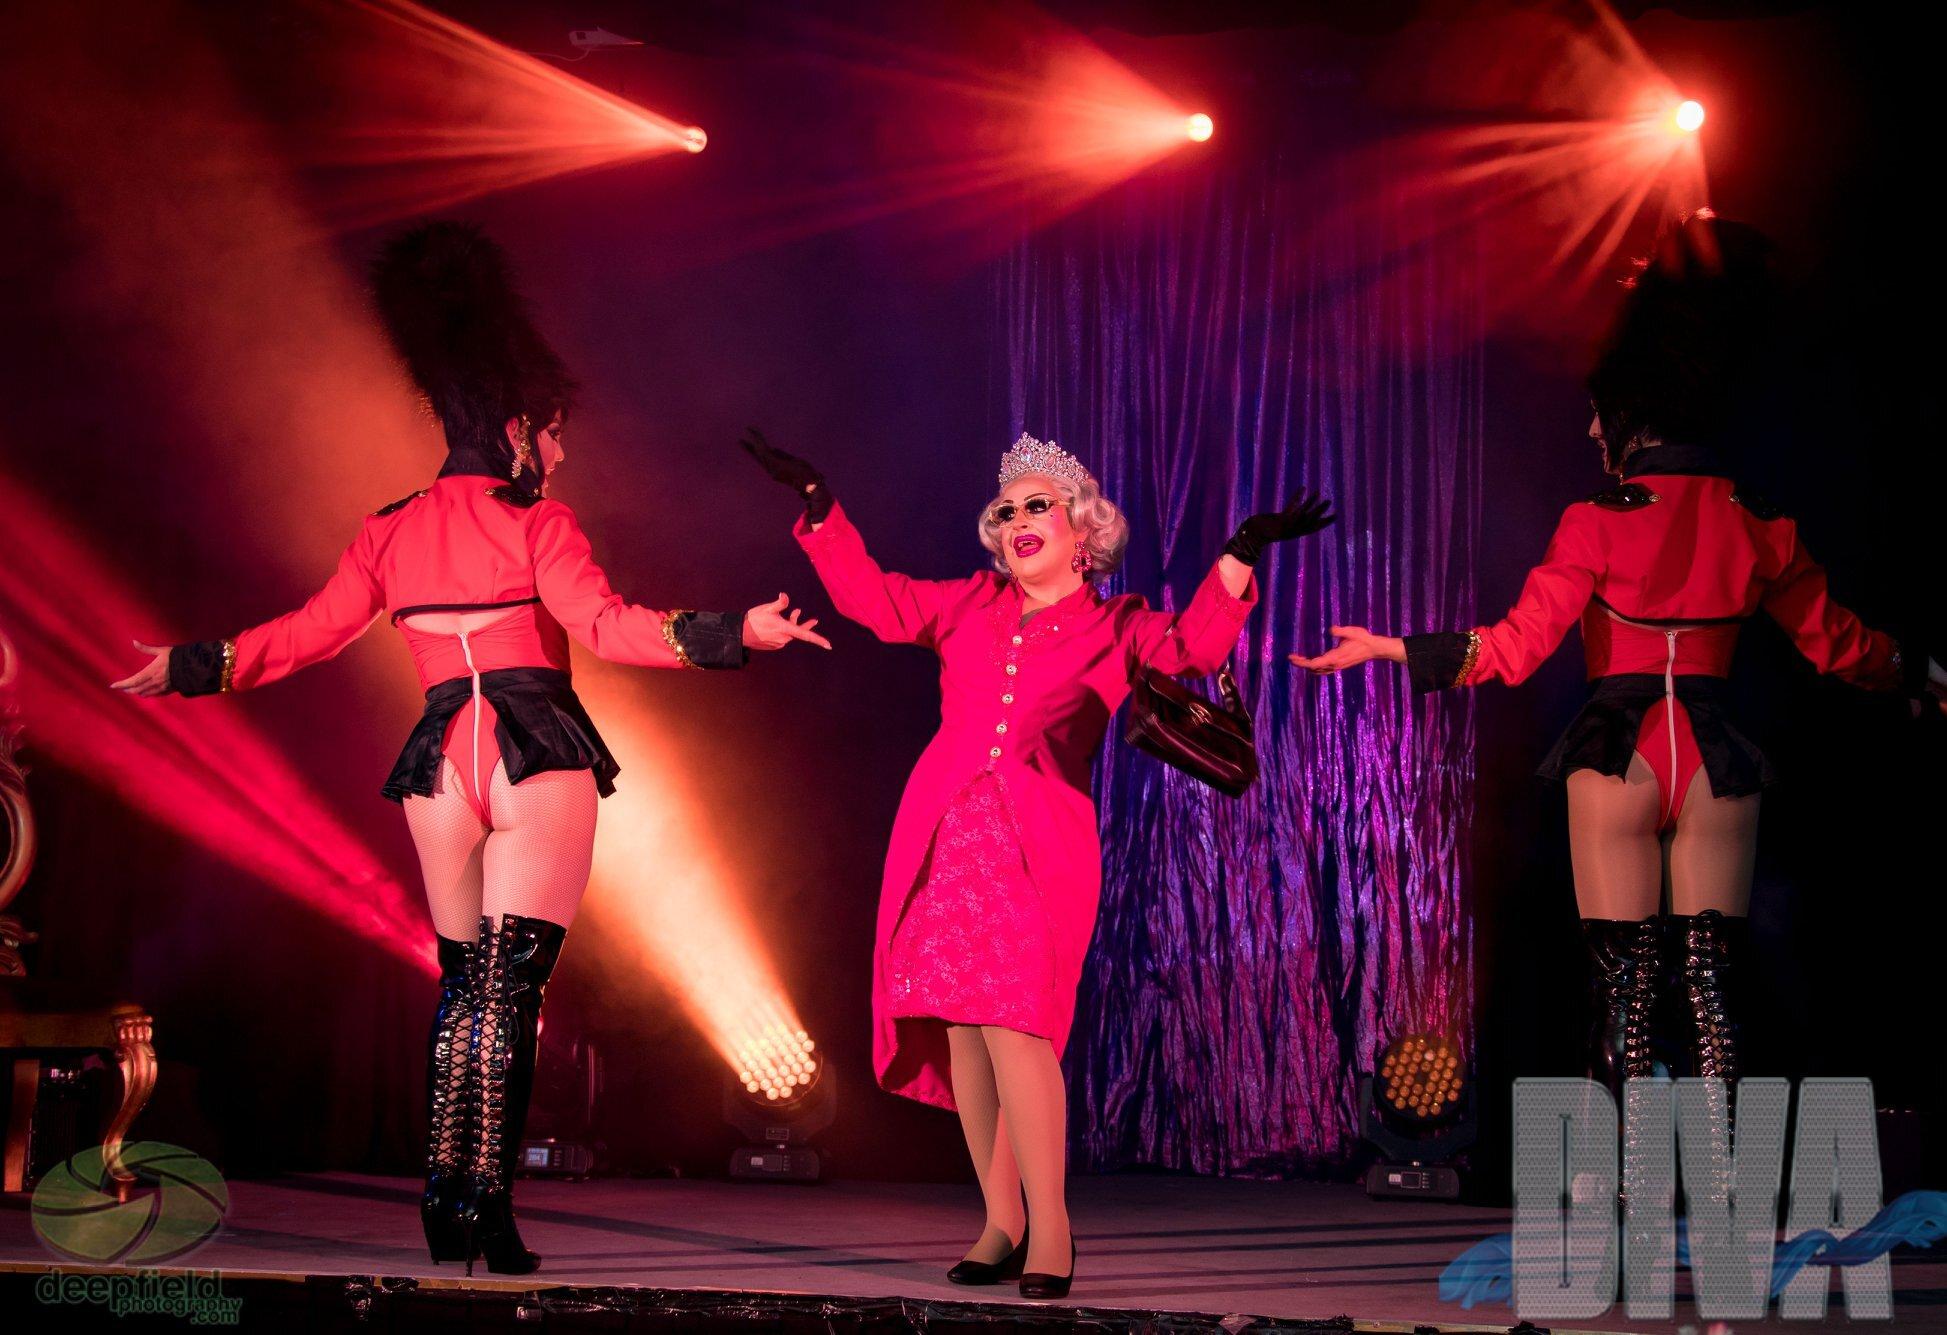 brits-n-pieces-hannah-conda-carmen-geddit-sia-tequila-diva-awards-sydney-drag-queen-royalty-best-hire-drag-race-australia-9.jpg